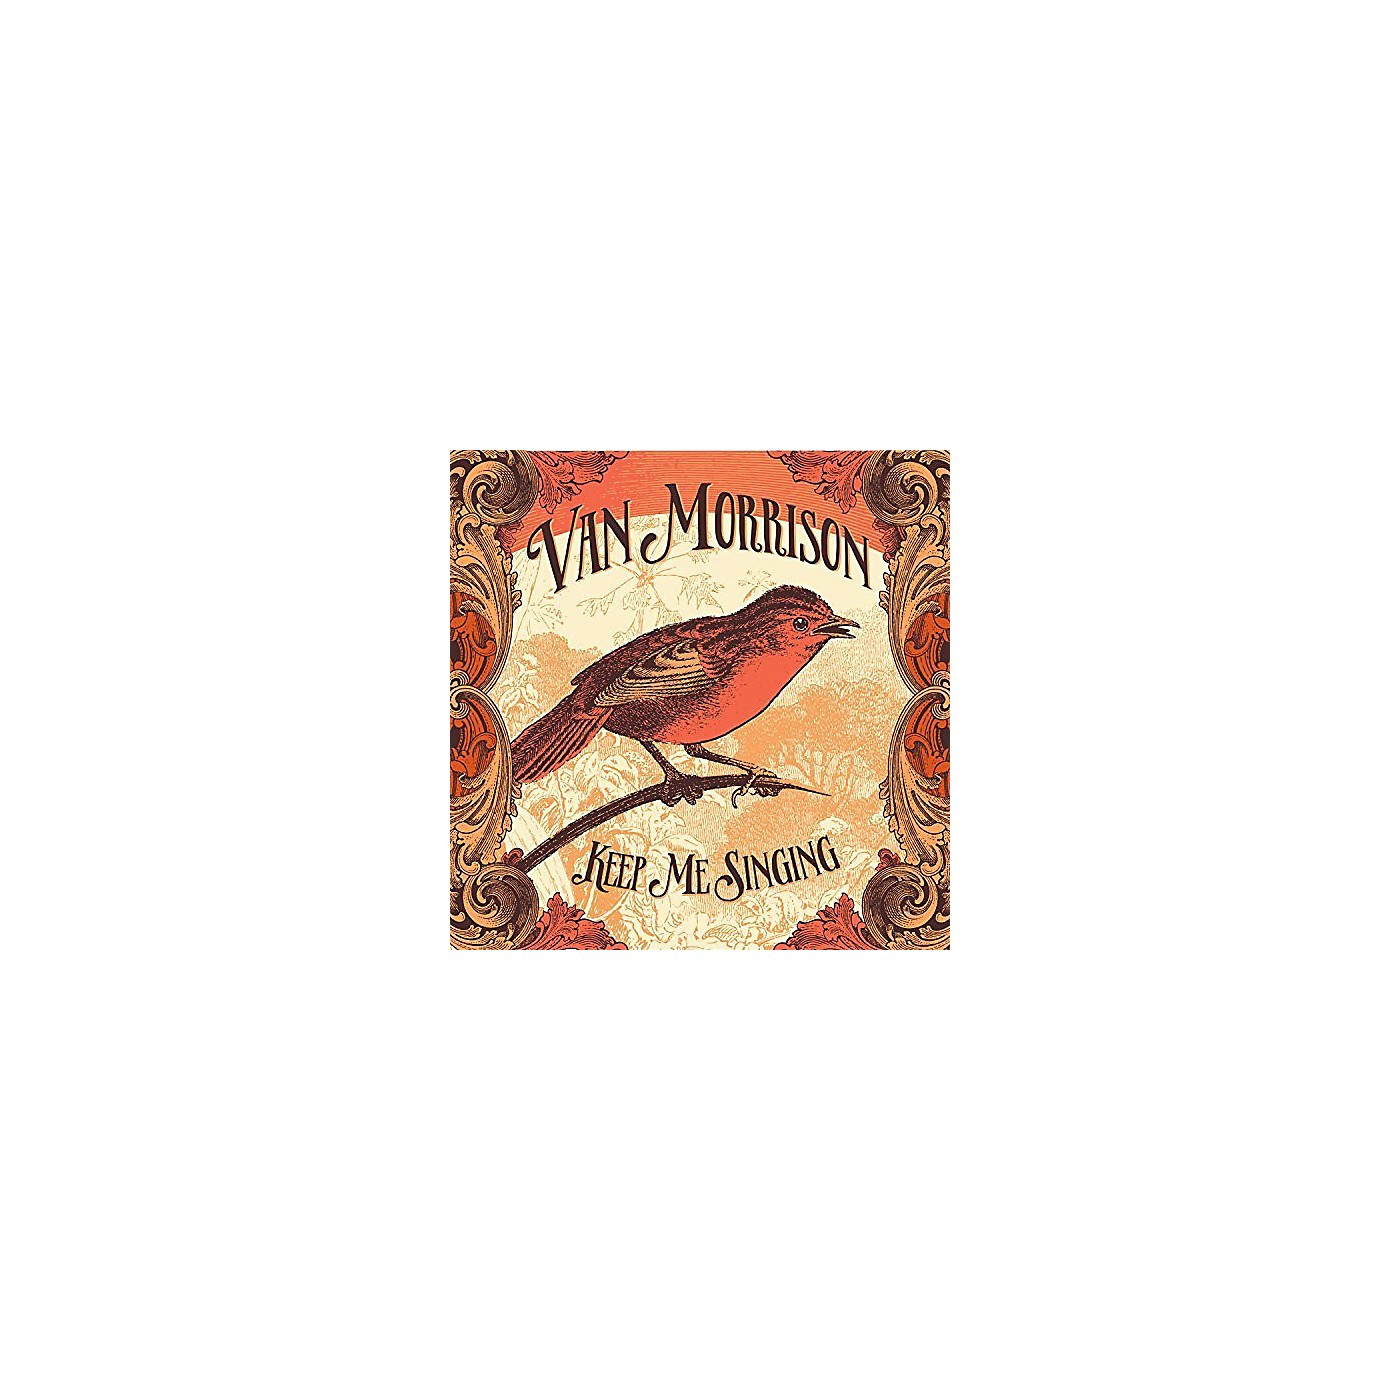 Alliance Van Morrison - Keep Me Singing [Lenticular Edition] thumbnail